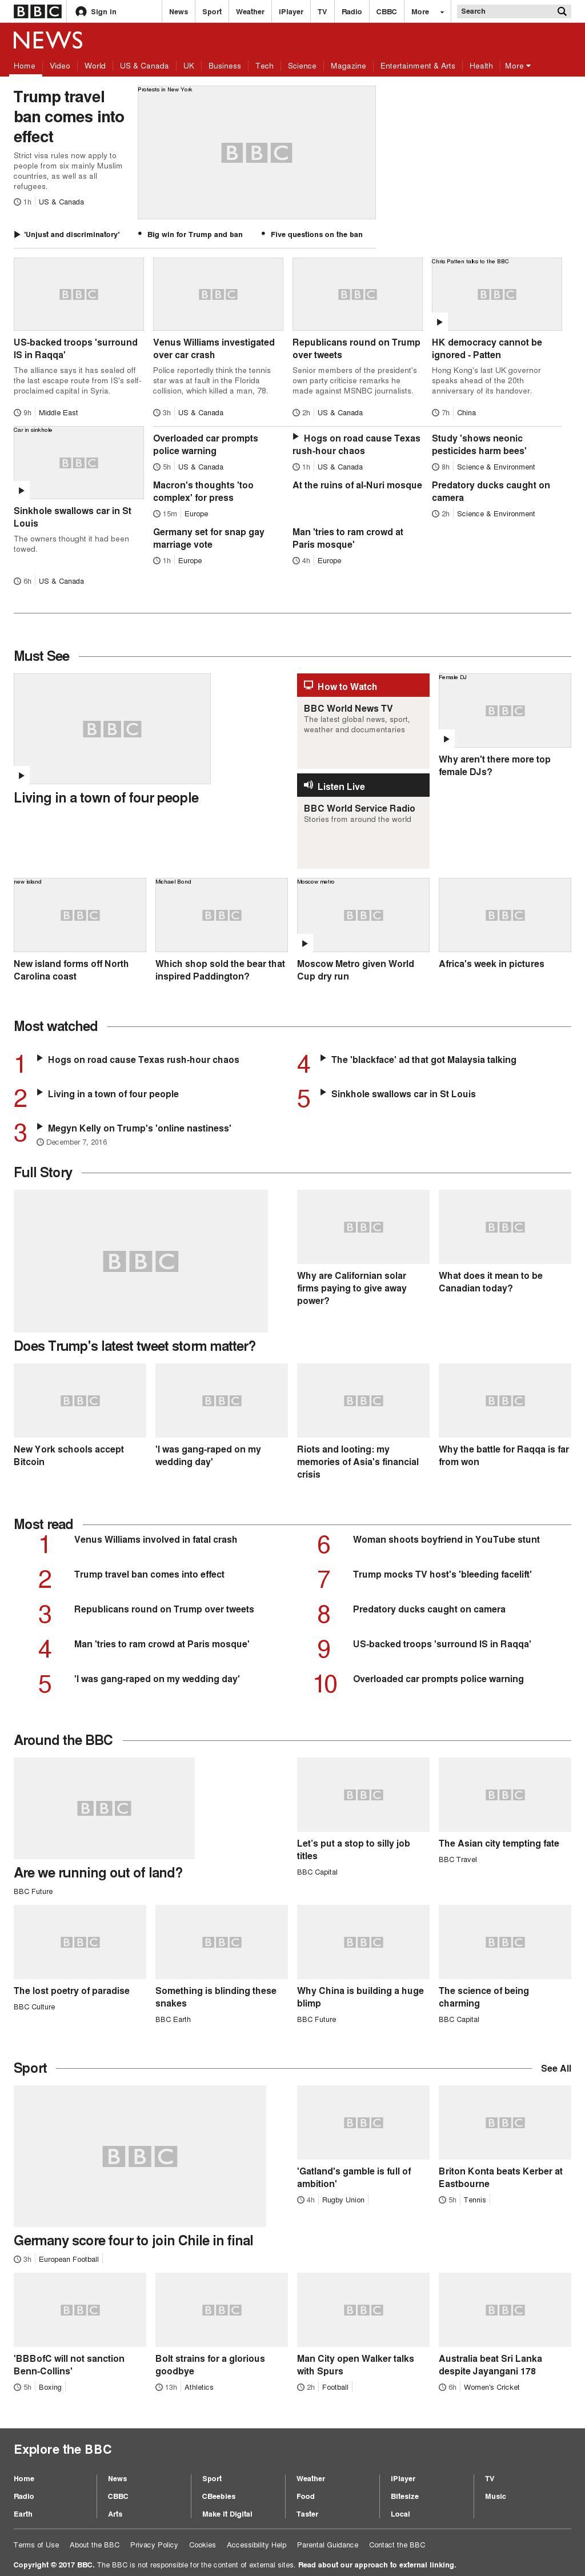 BBC at Friday June 30, 2017, 2 a.m. UTC